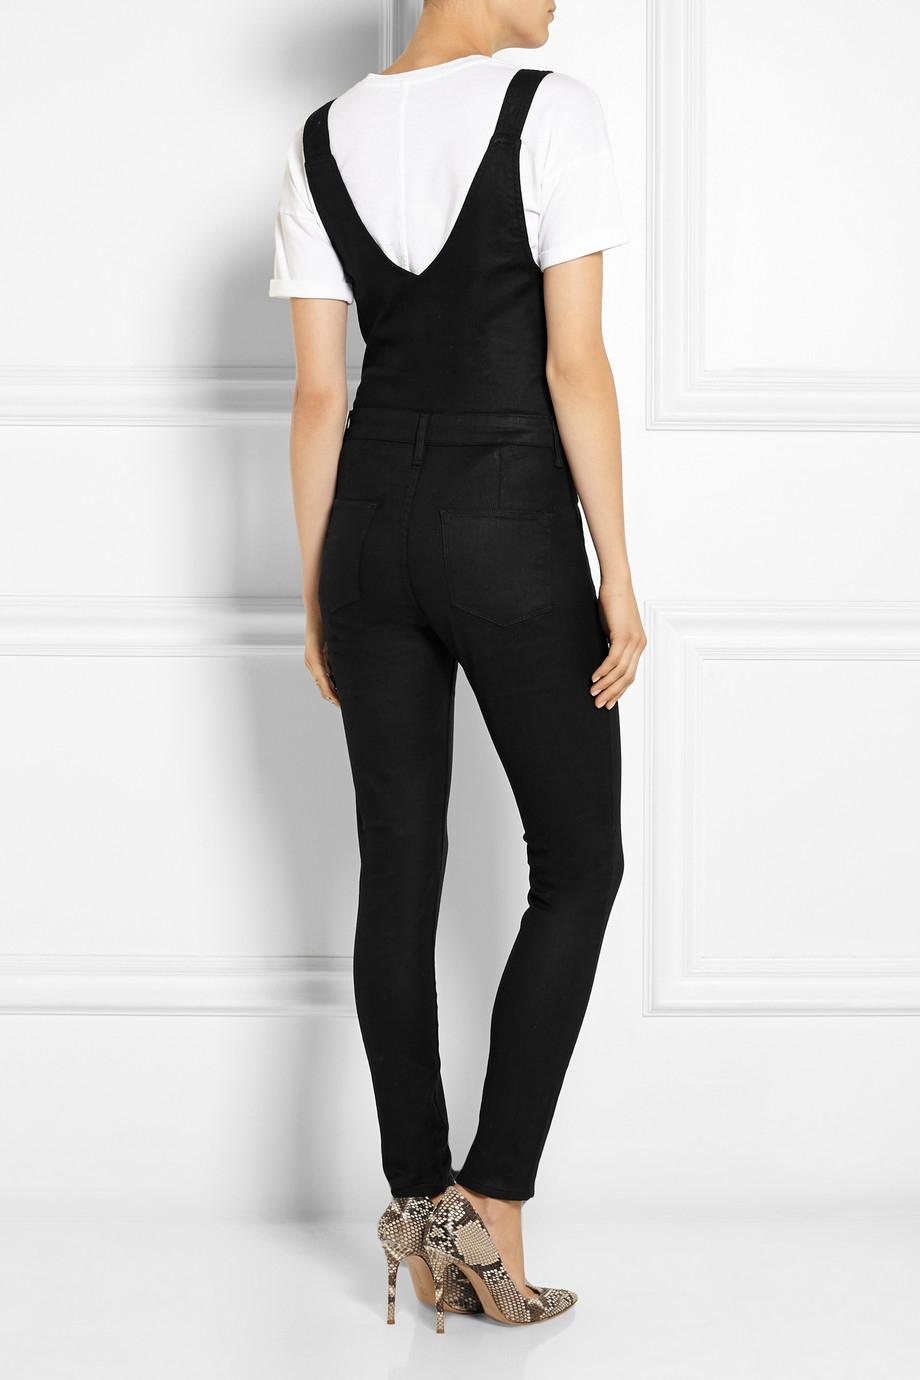 Lyst - Frame Le High Skinny Stretch-Denim Overalls in Black